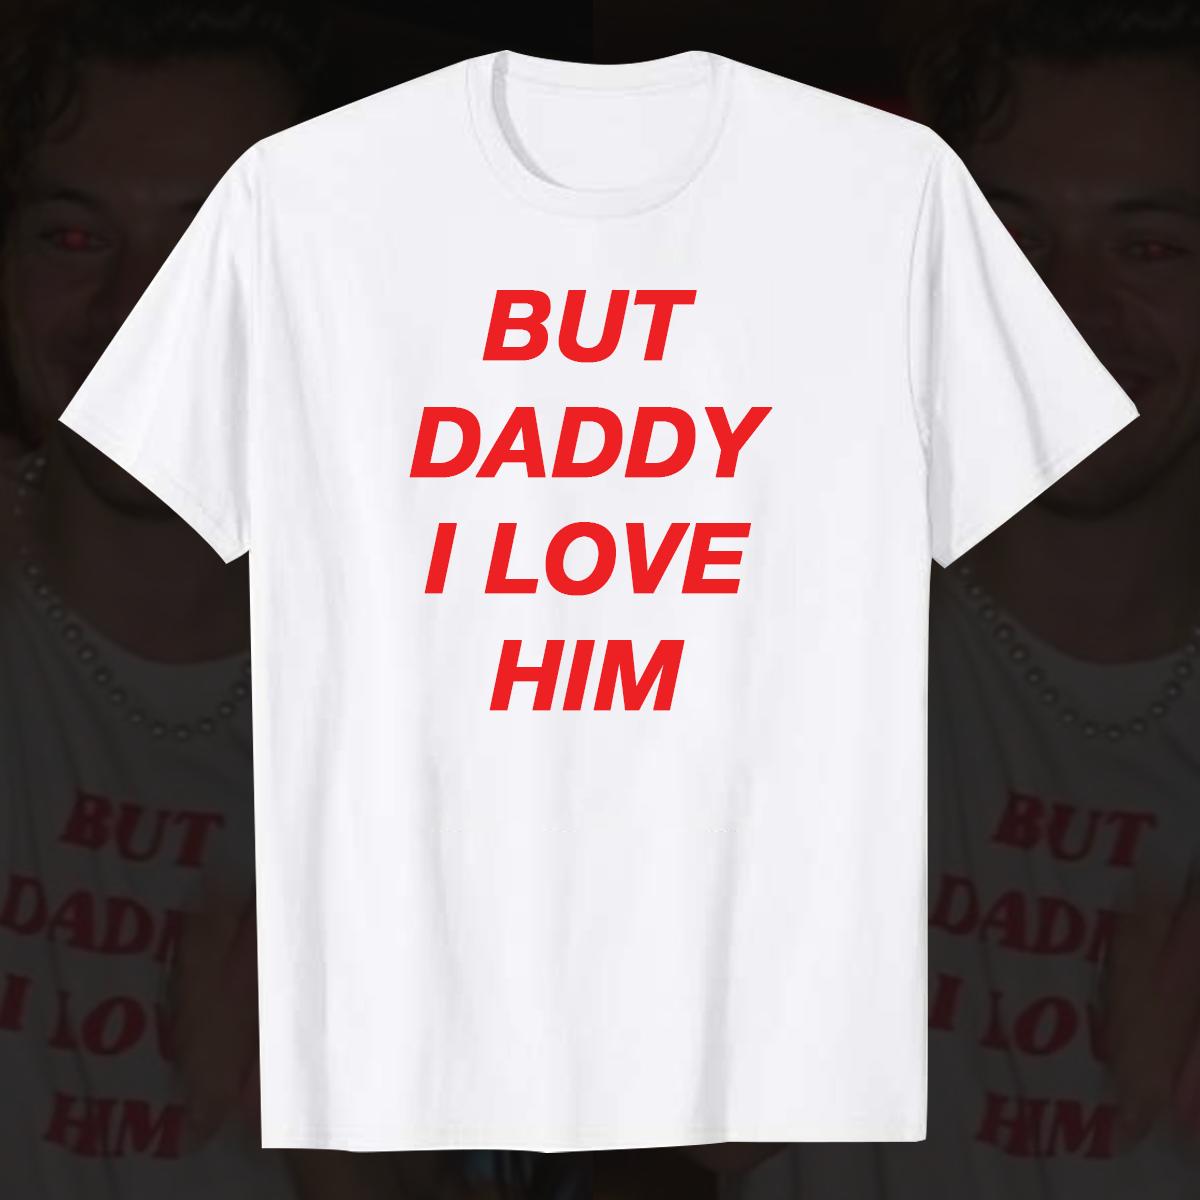 Harry Styles Shirt But Daddy I Love Him Shirt Harry Styles But Daddy I Love Him